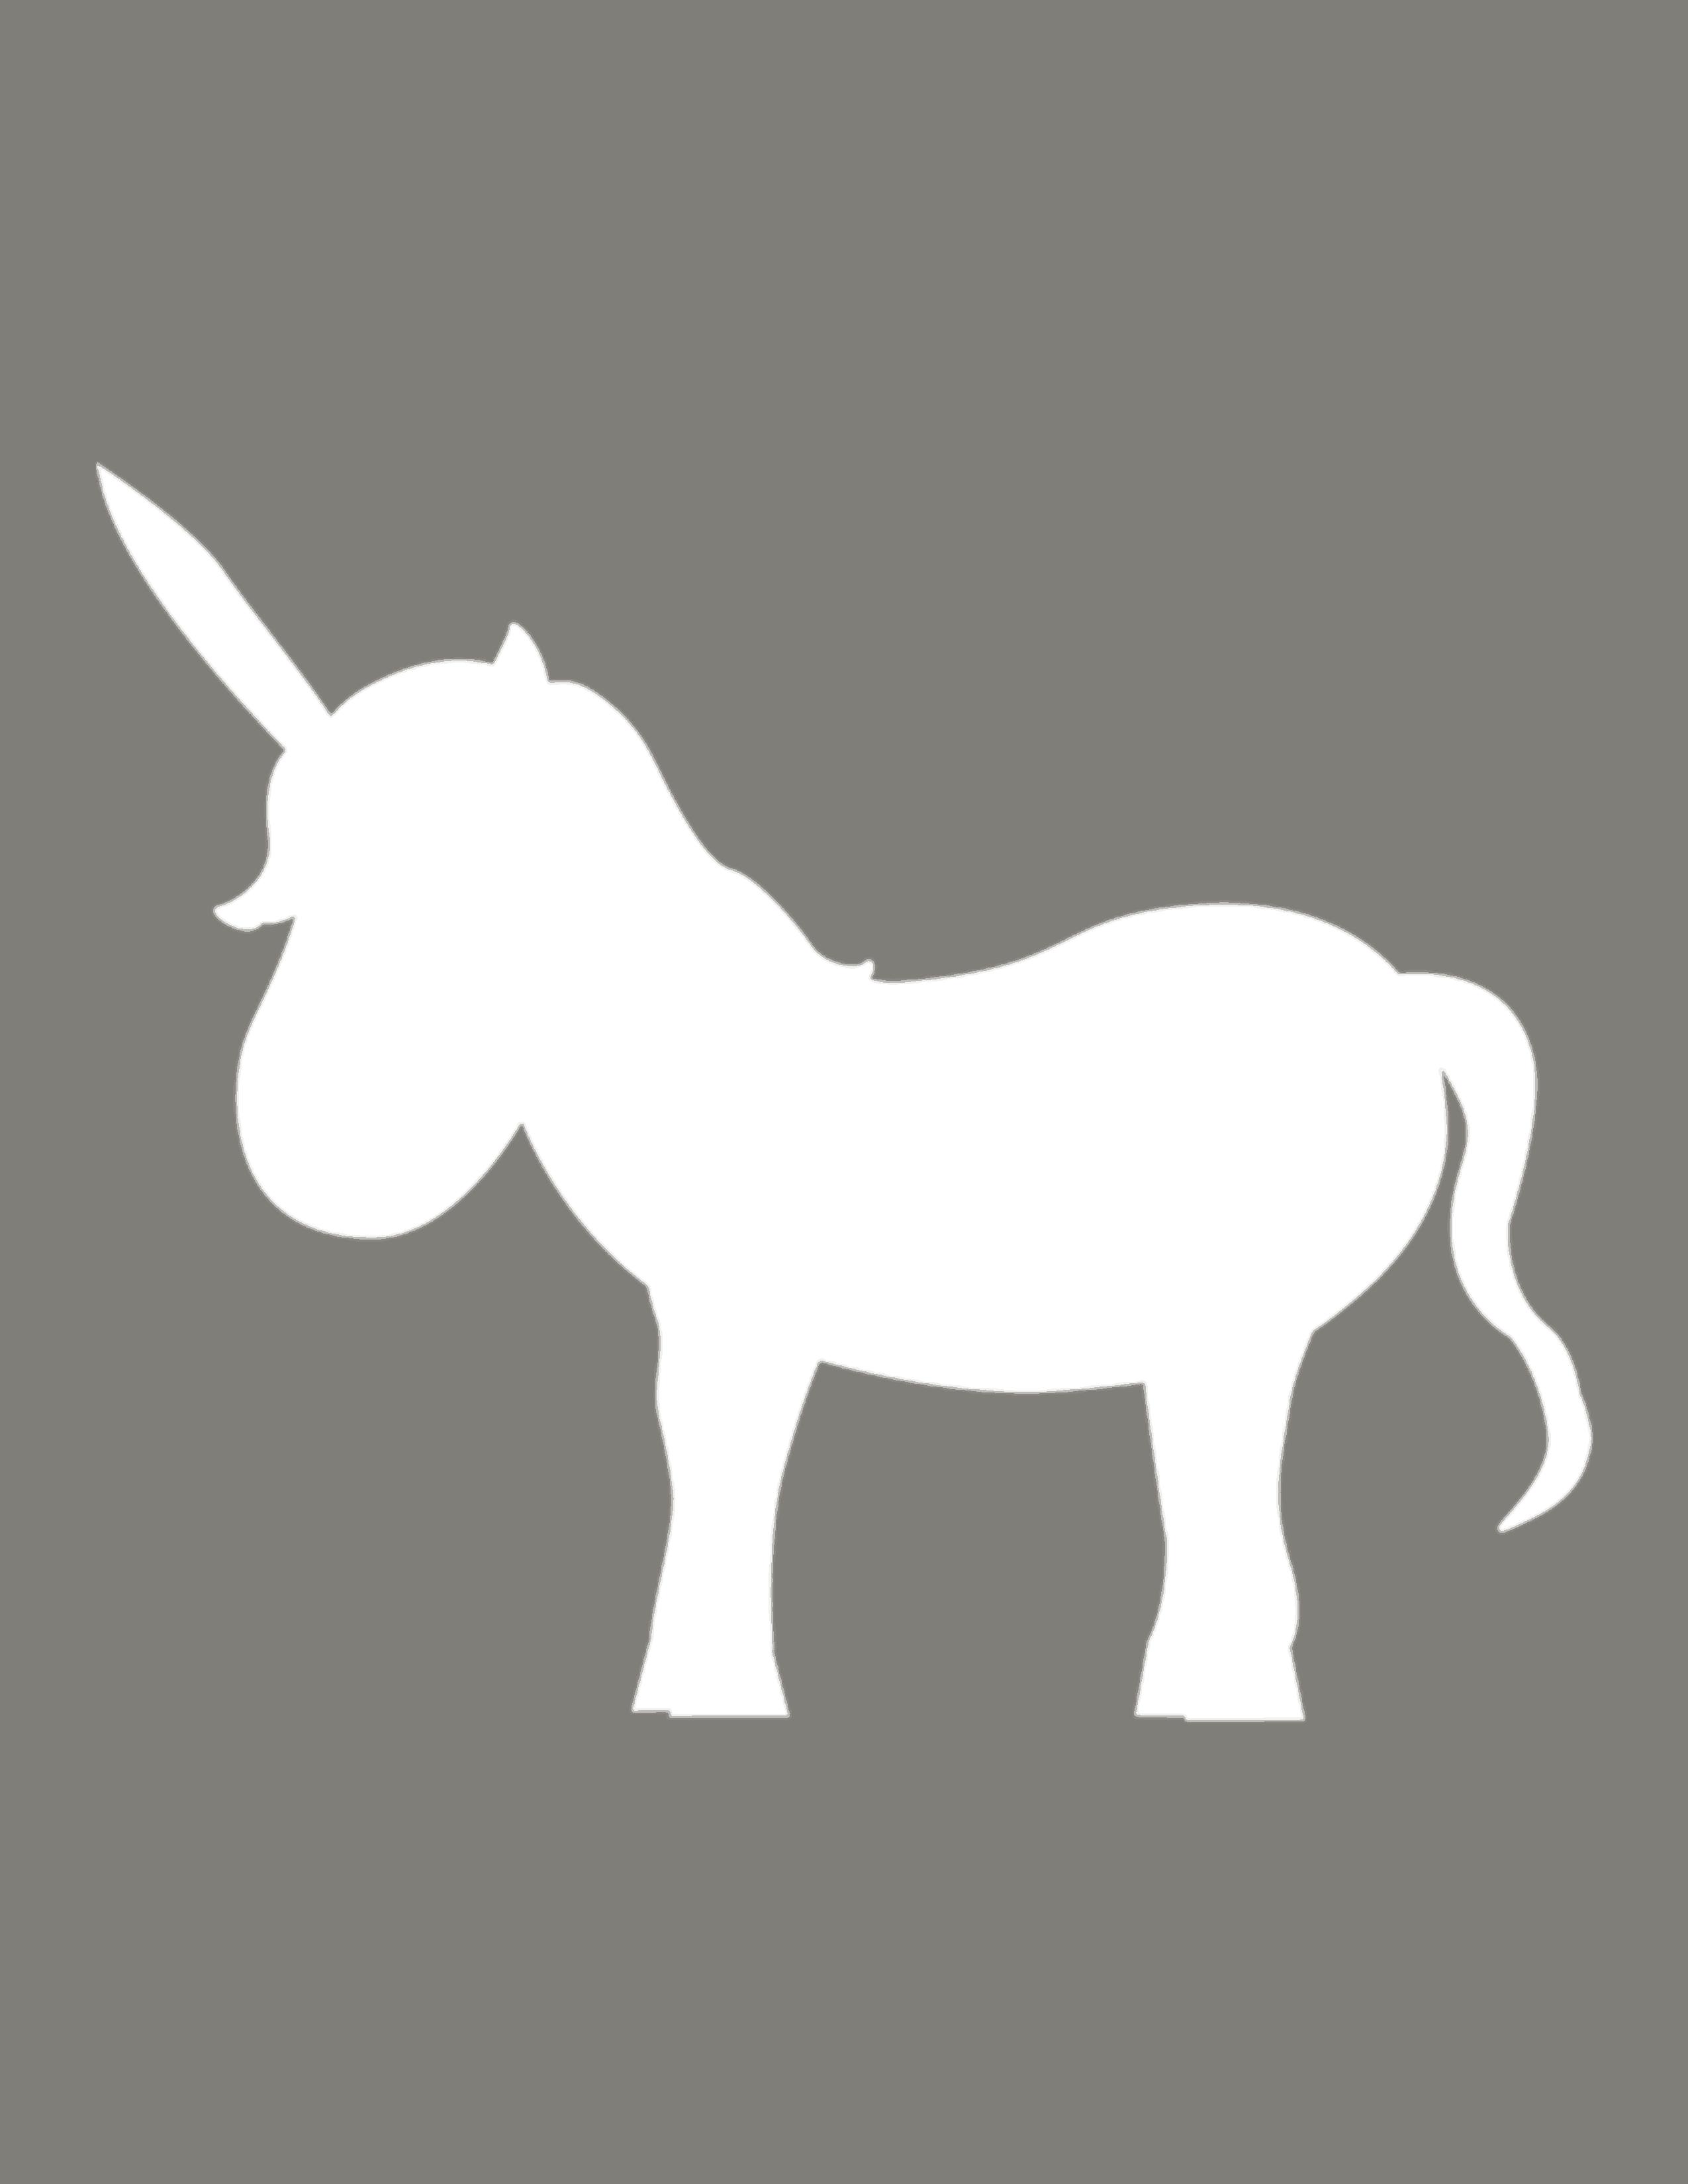 Large Unicorn template